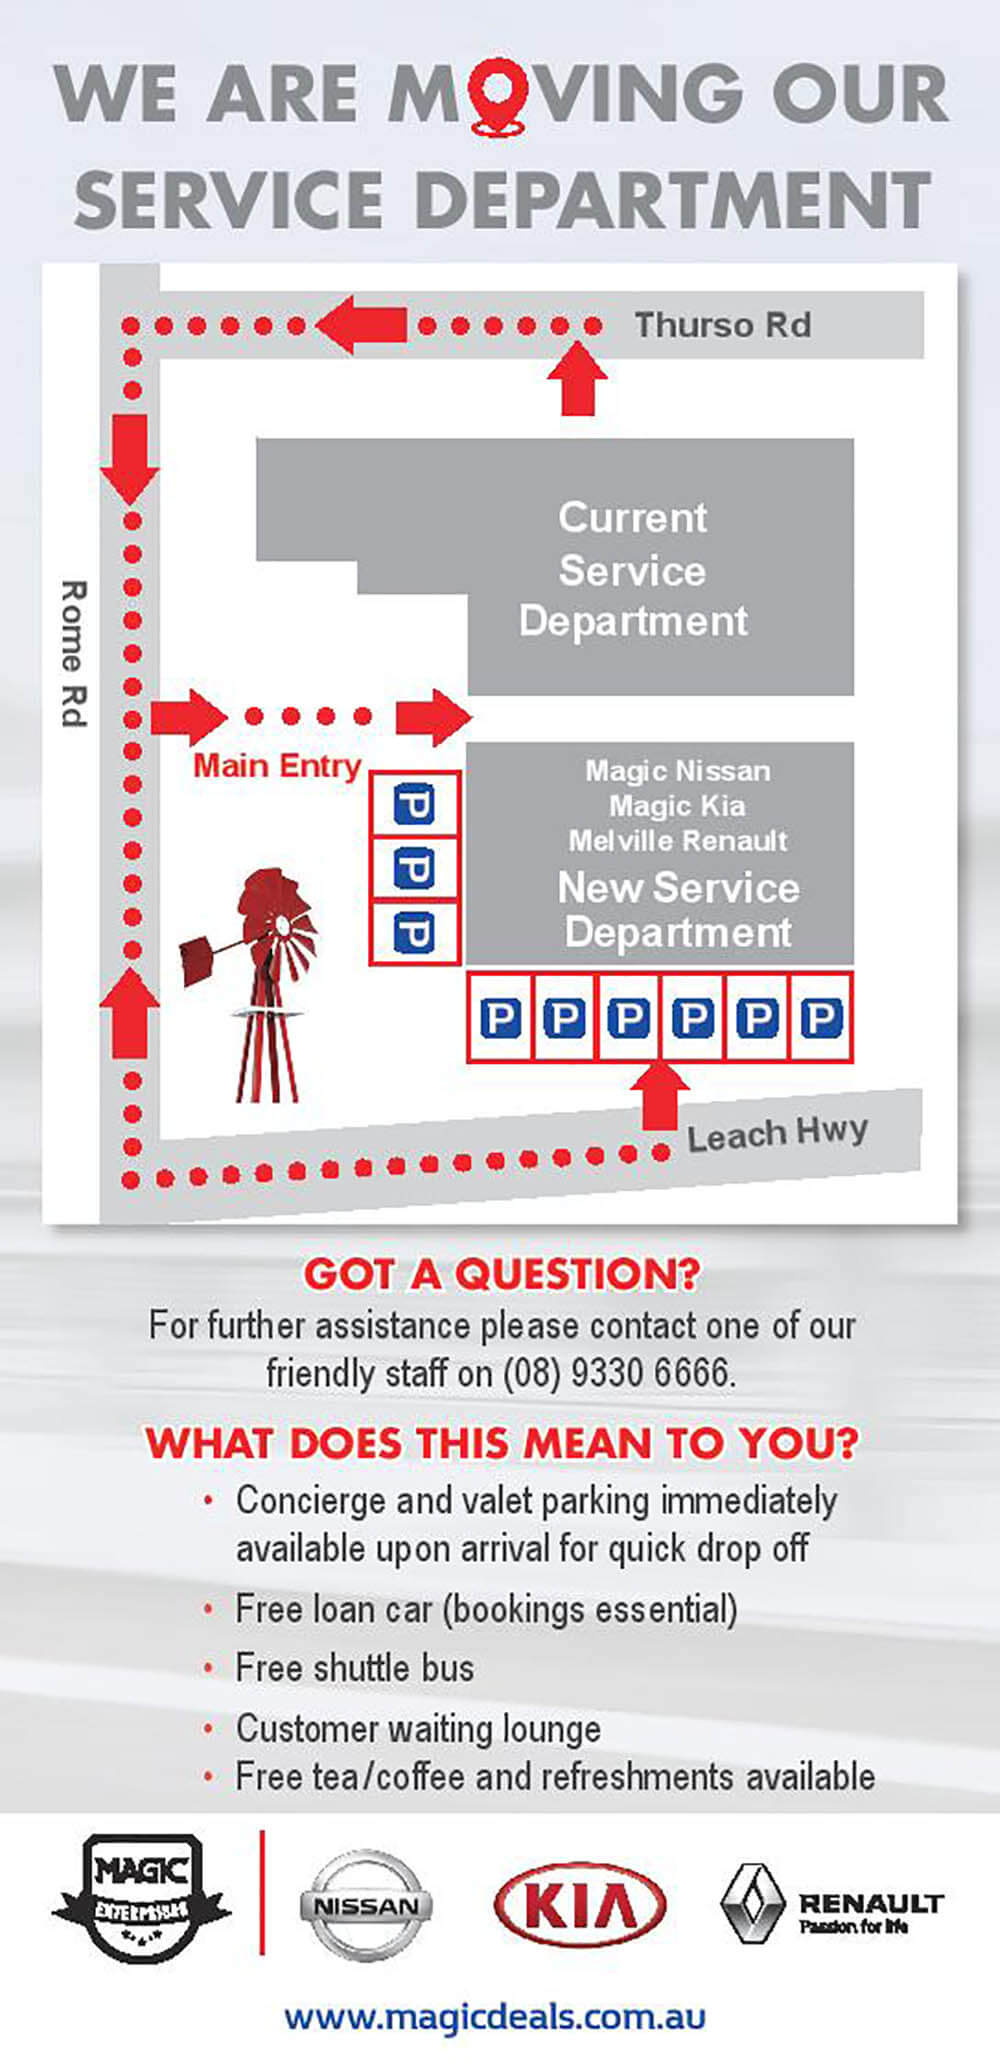 Magic Group Service Move